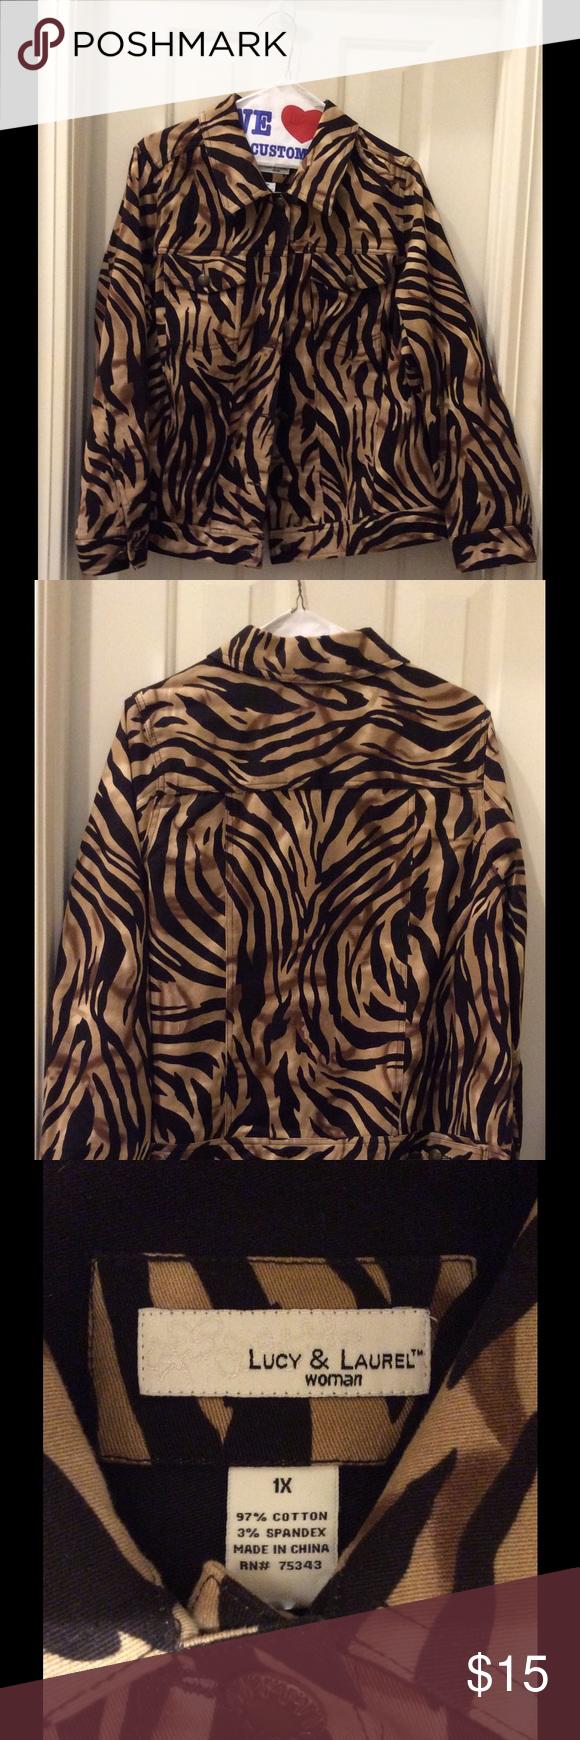 54bc71a85afa Tiger print denim jacket! Tiger print denim jacket! EUC! Lucy & Laurel  Jackets & Coats Jean Jackets